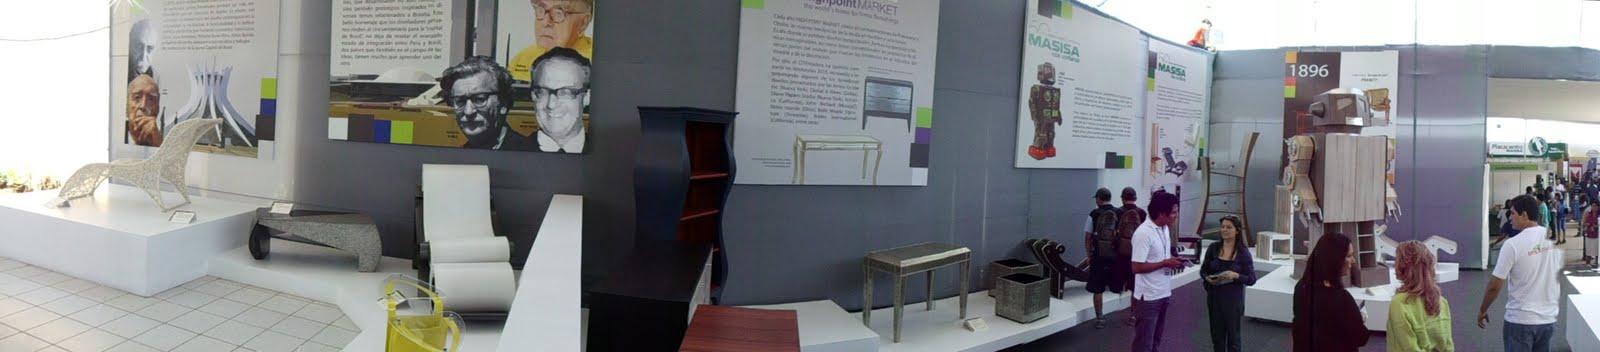 Dise a per innova muebles 2011 for Innova muebles